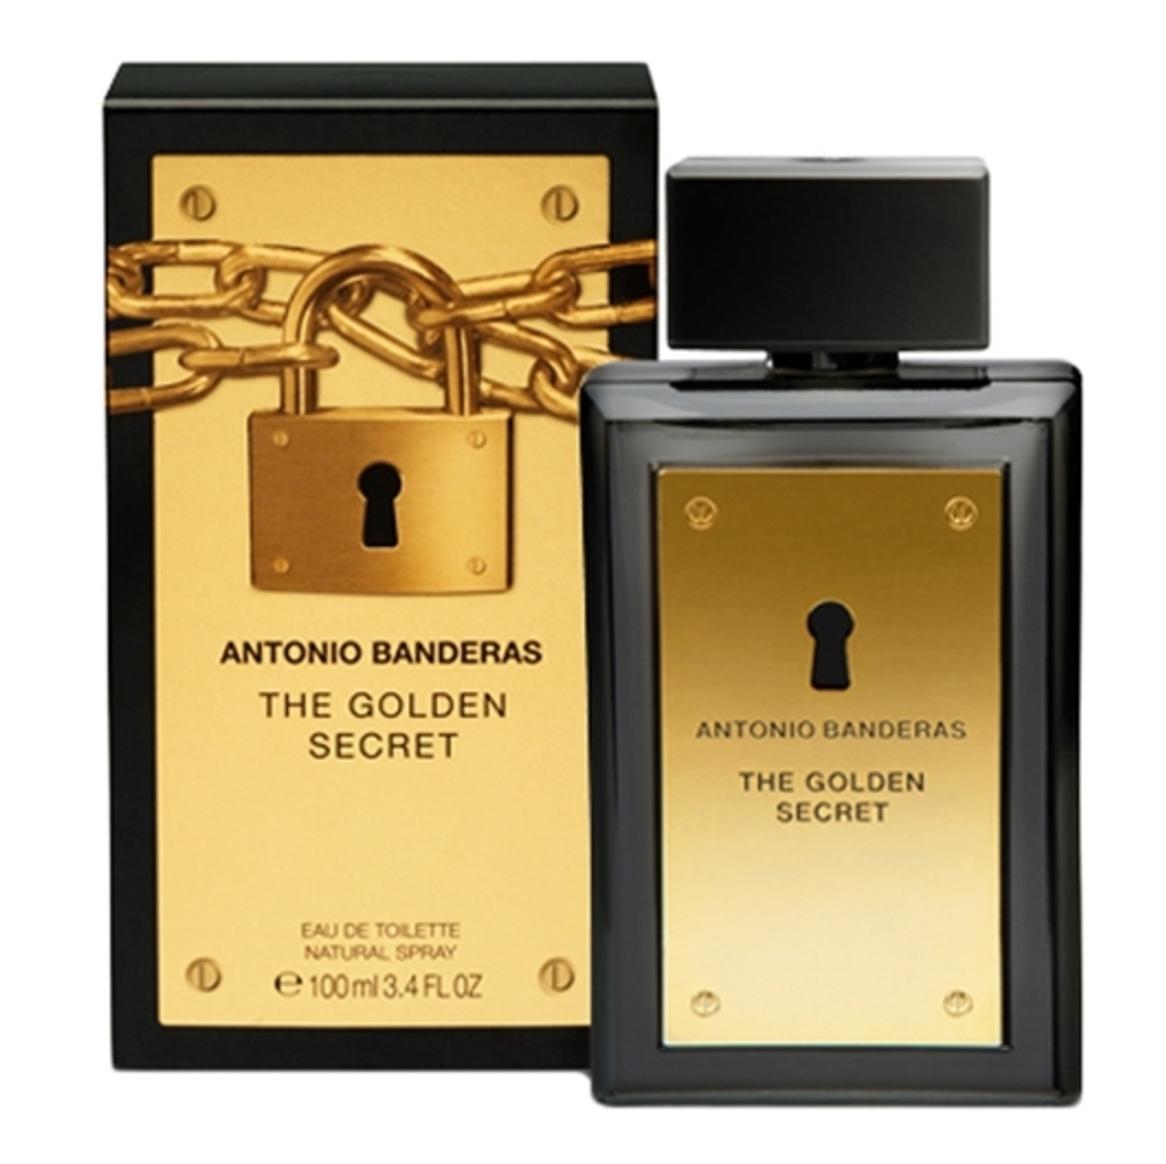 8dc9f9eb01 4ac1cac4b56778cb6c1e05b2e737d339 1.jpg. oiOferta   Perfumaria e Cosméticos    Perfumes   Perfumes Masculinos